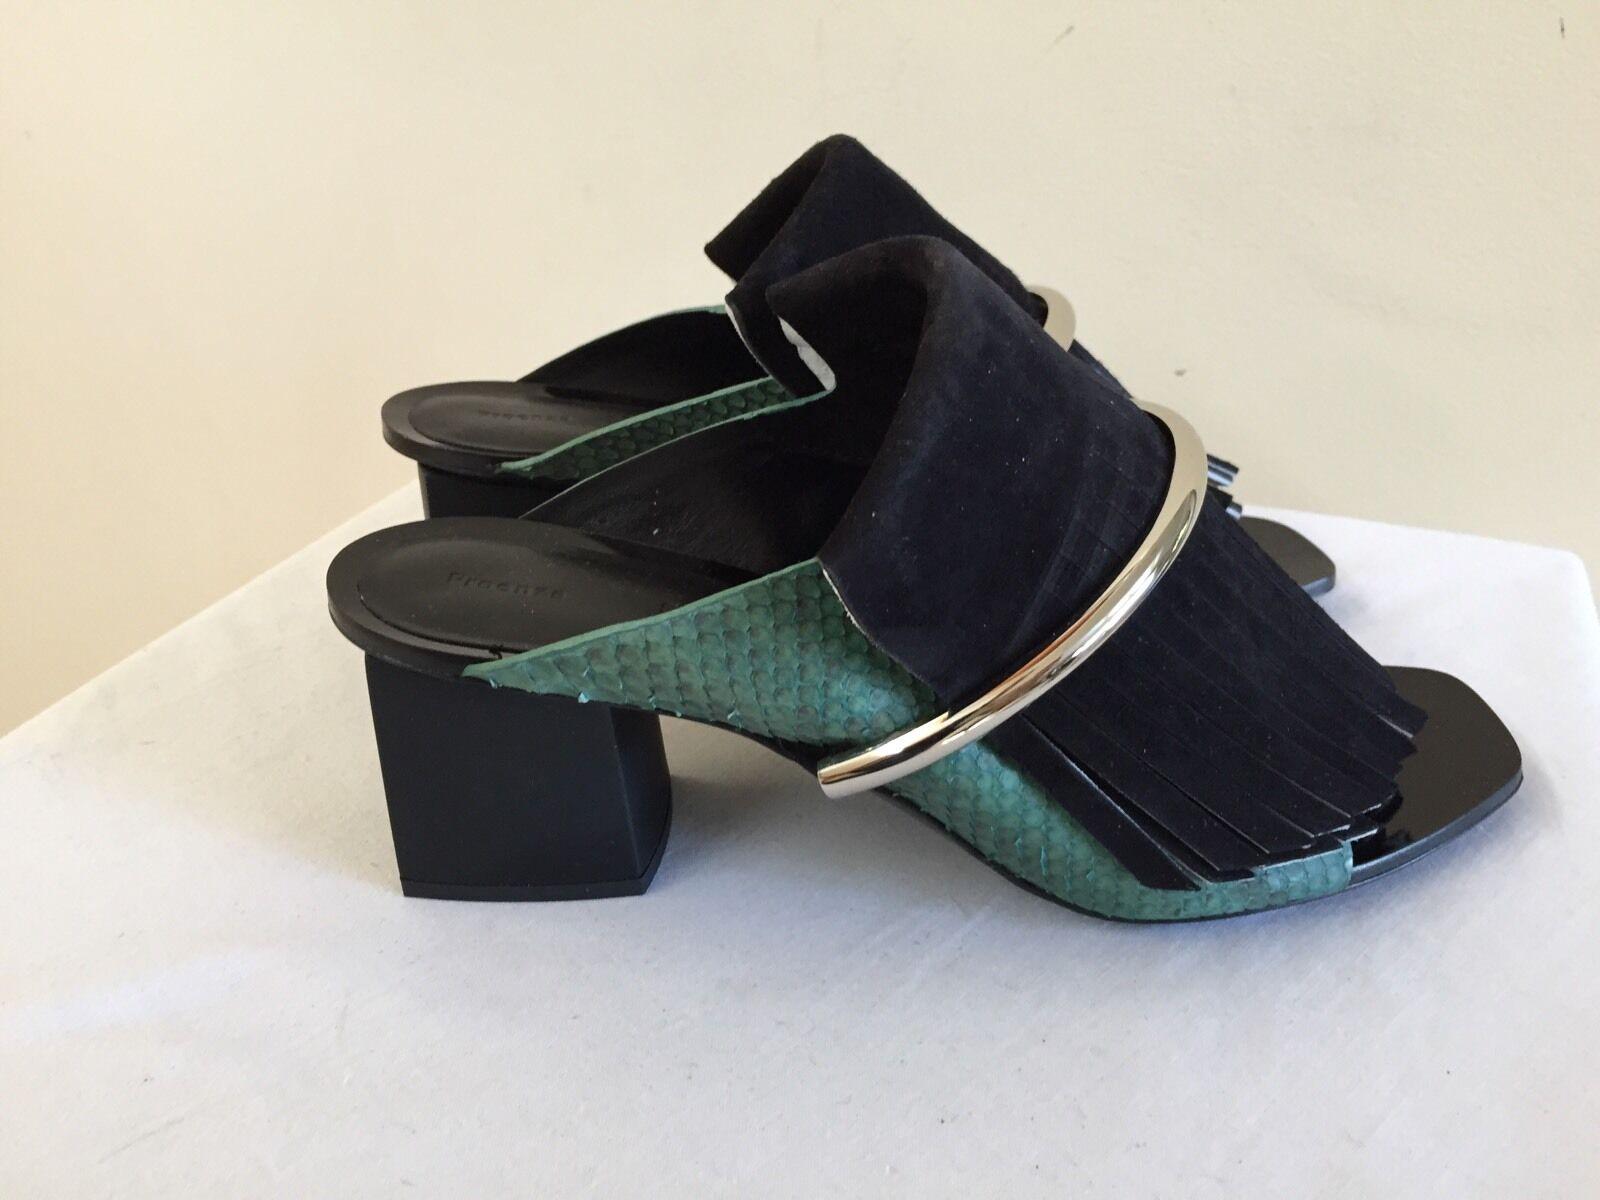 New w/o Box PROENZA SCHOULER Black Suede Python Fringe Mules Shoes 39/9